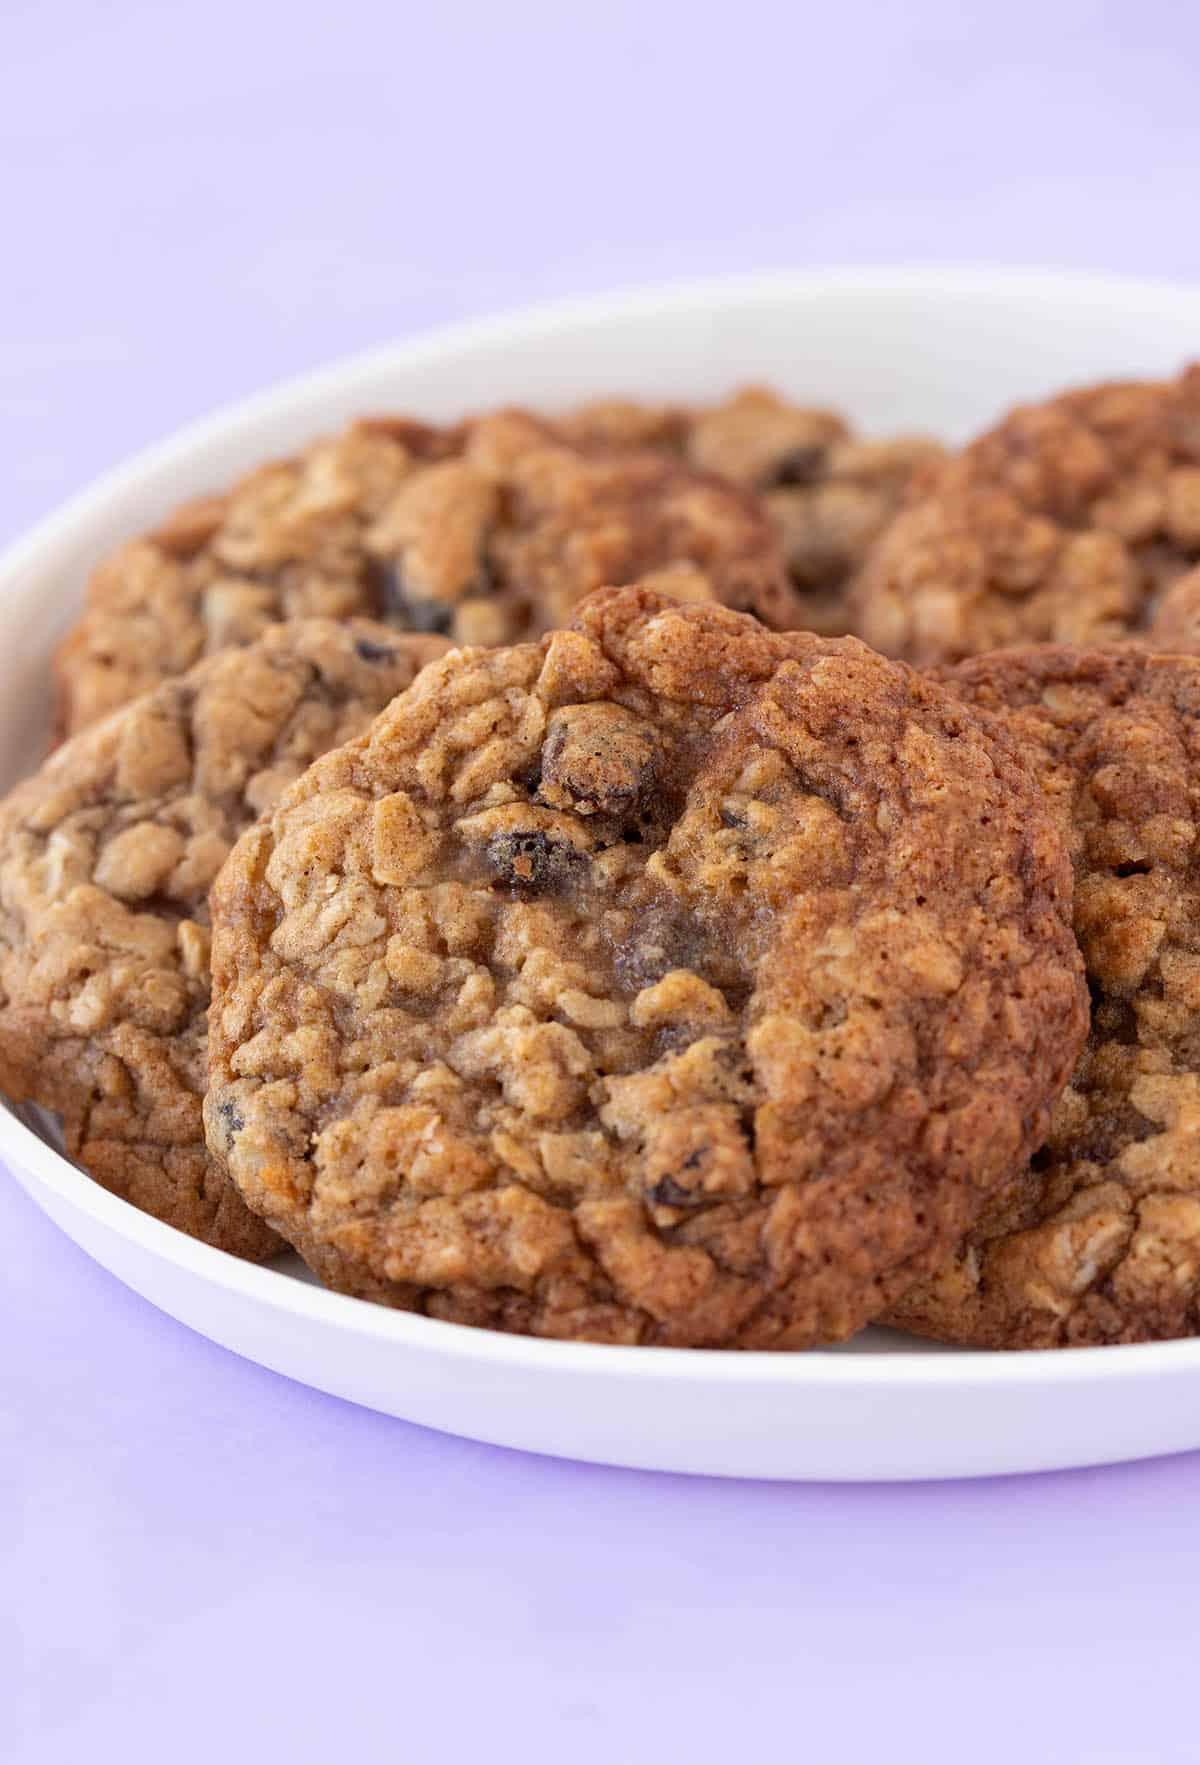 A plate of homemade Oatmeal Raisin Cookies